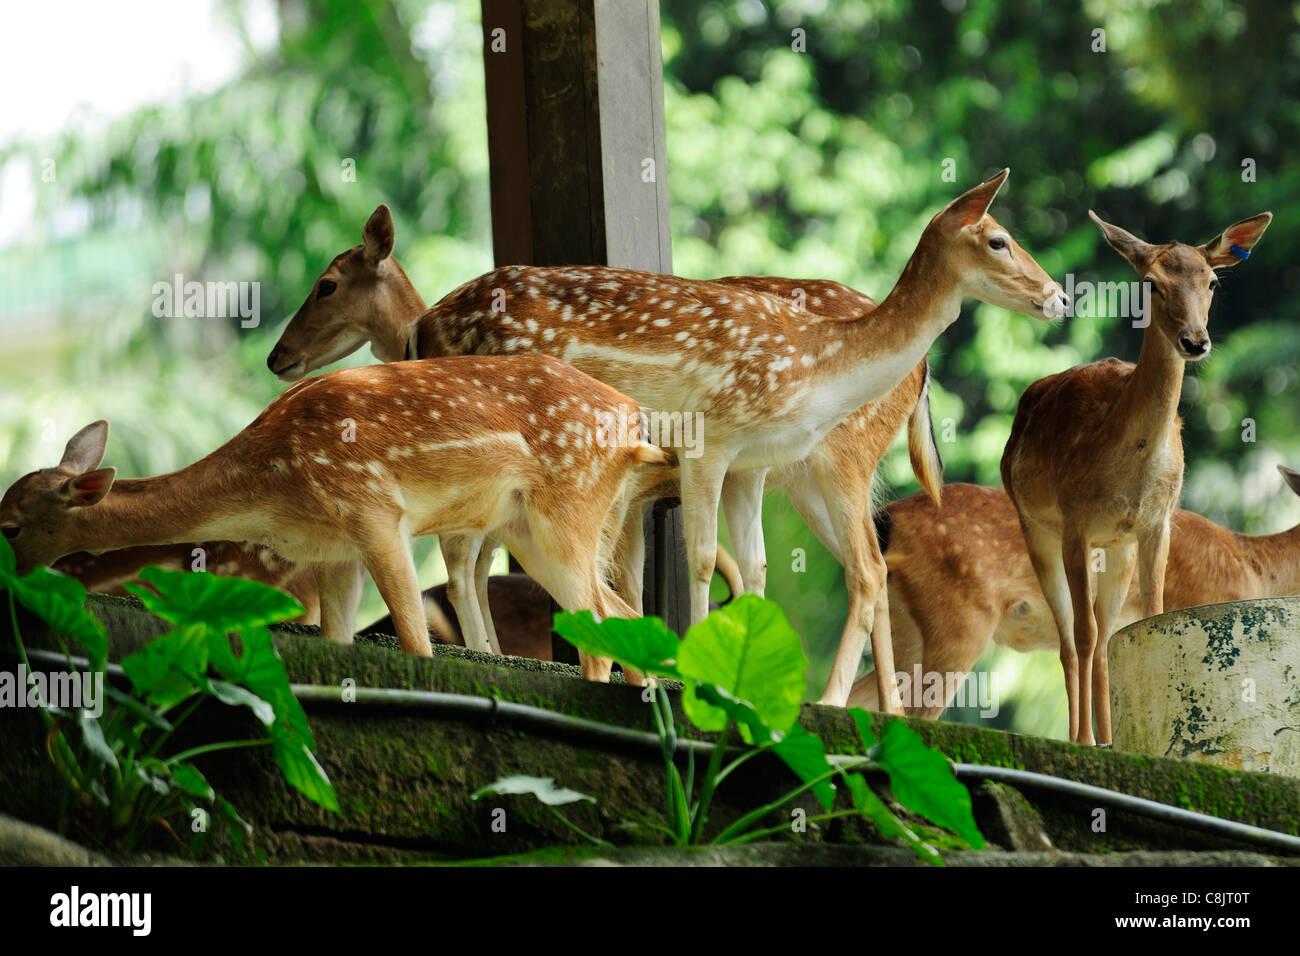 Deer Park within the Lake Gardens (Taman Tasik Perdana), Kuala Lumpur, Malaysia - Stock Image